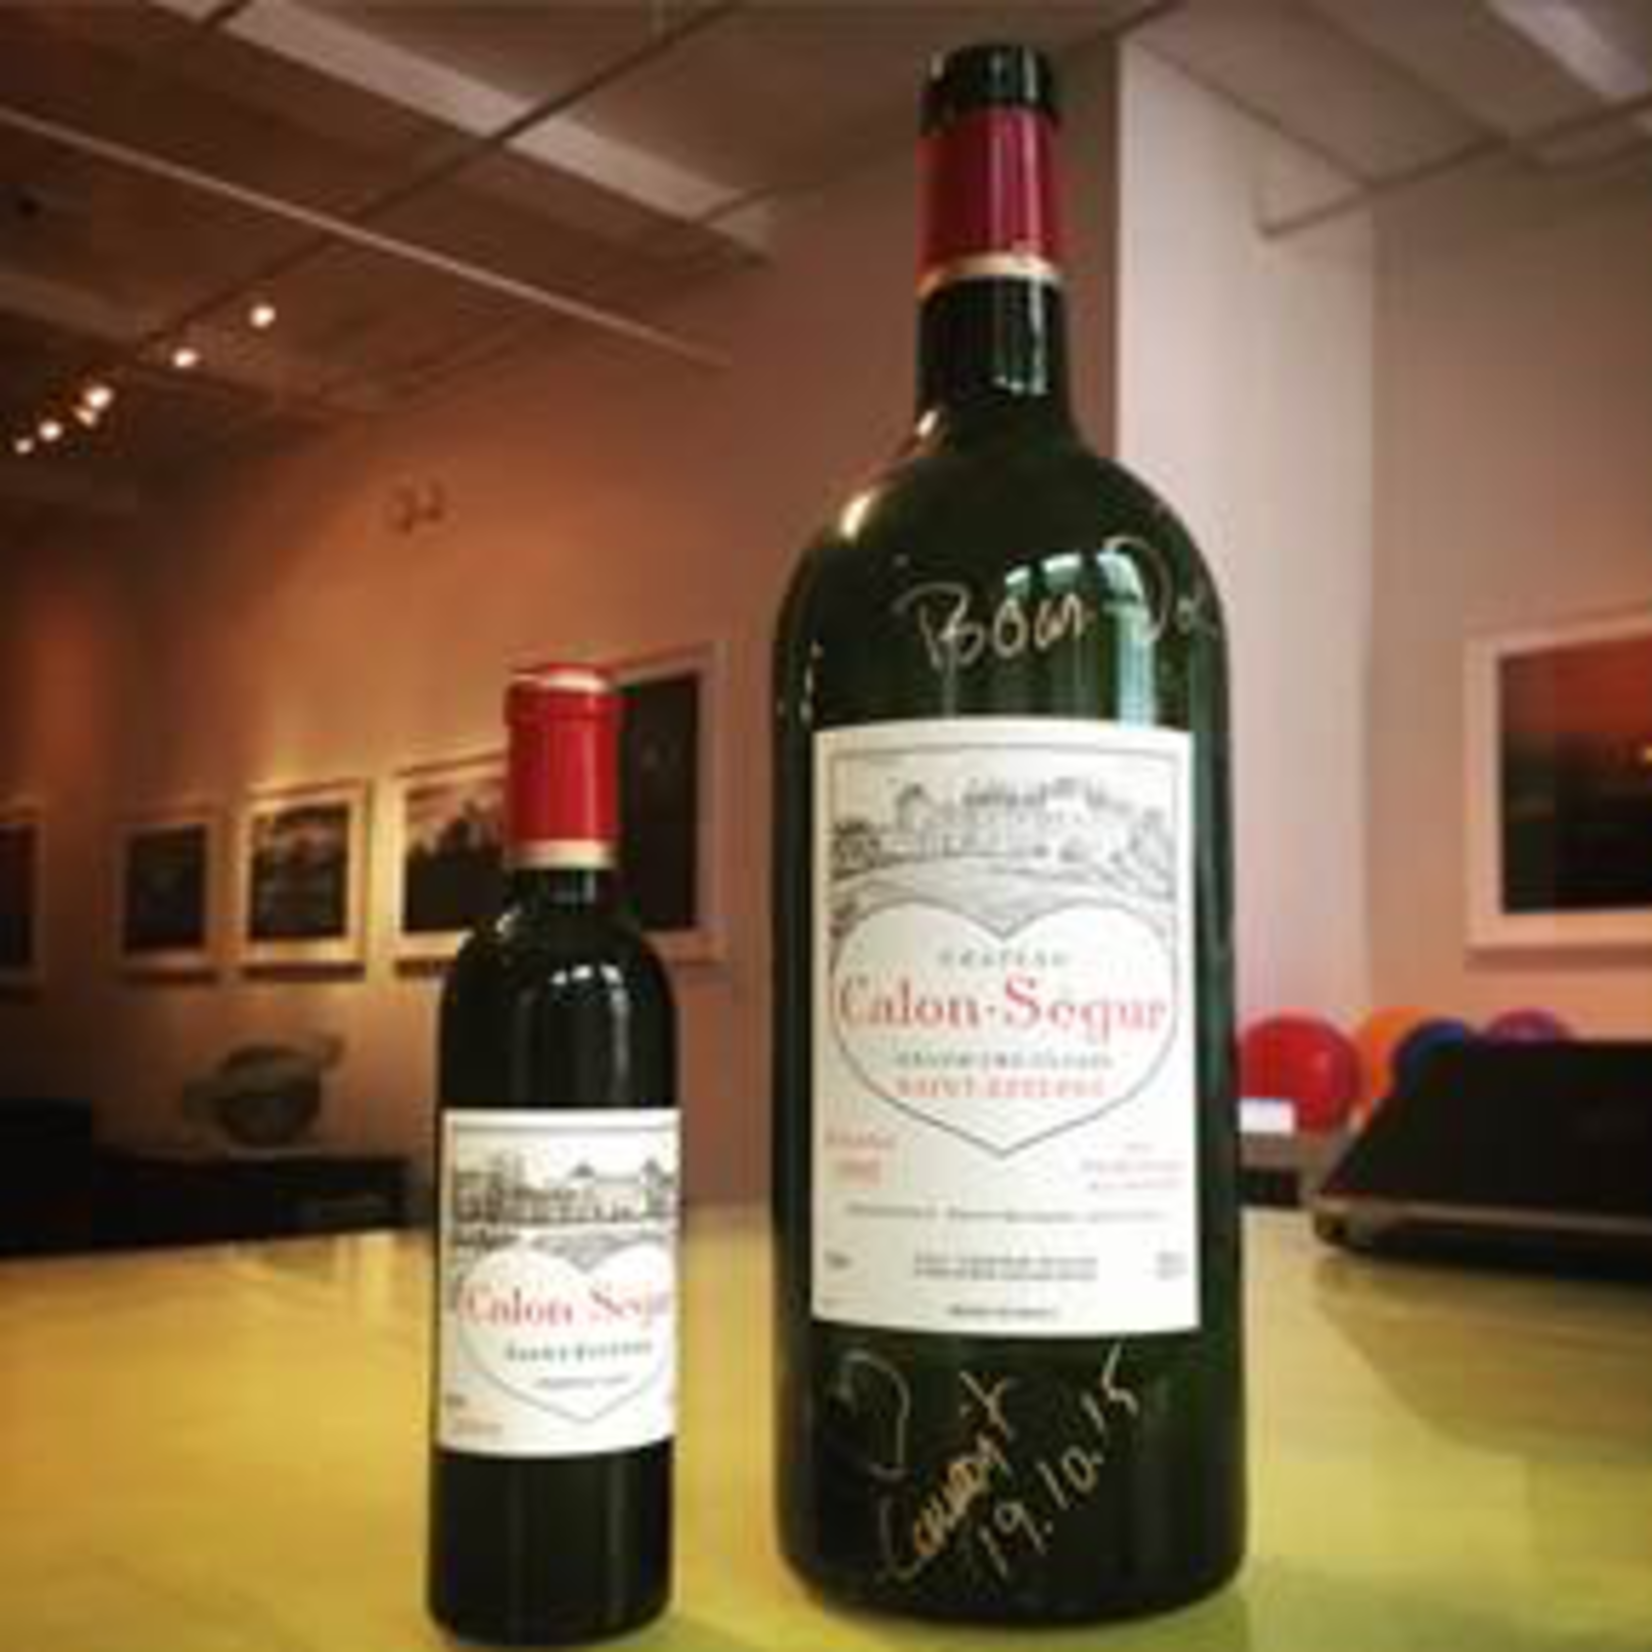 Wine Chateau Calon Segur 1996